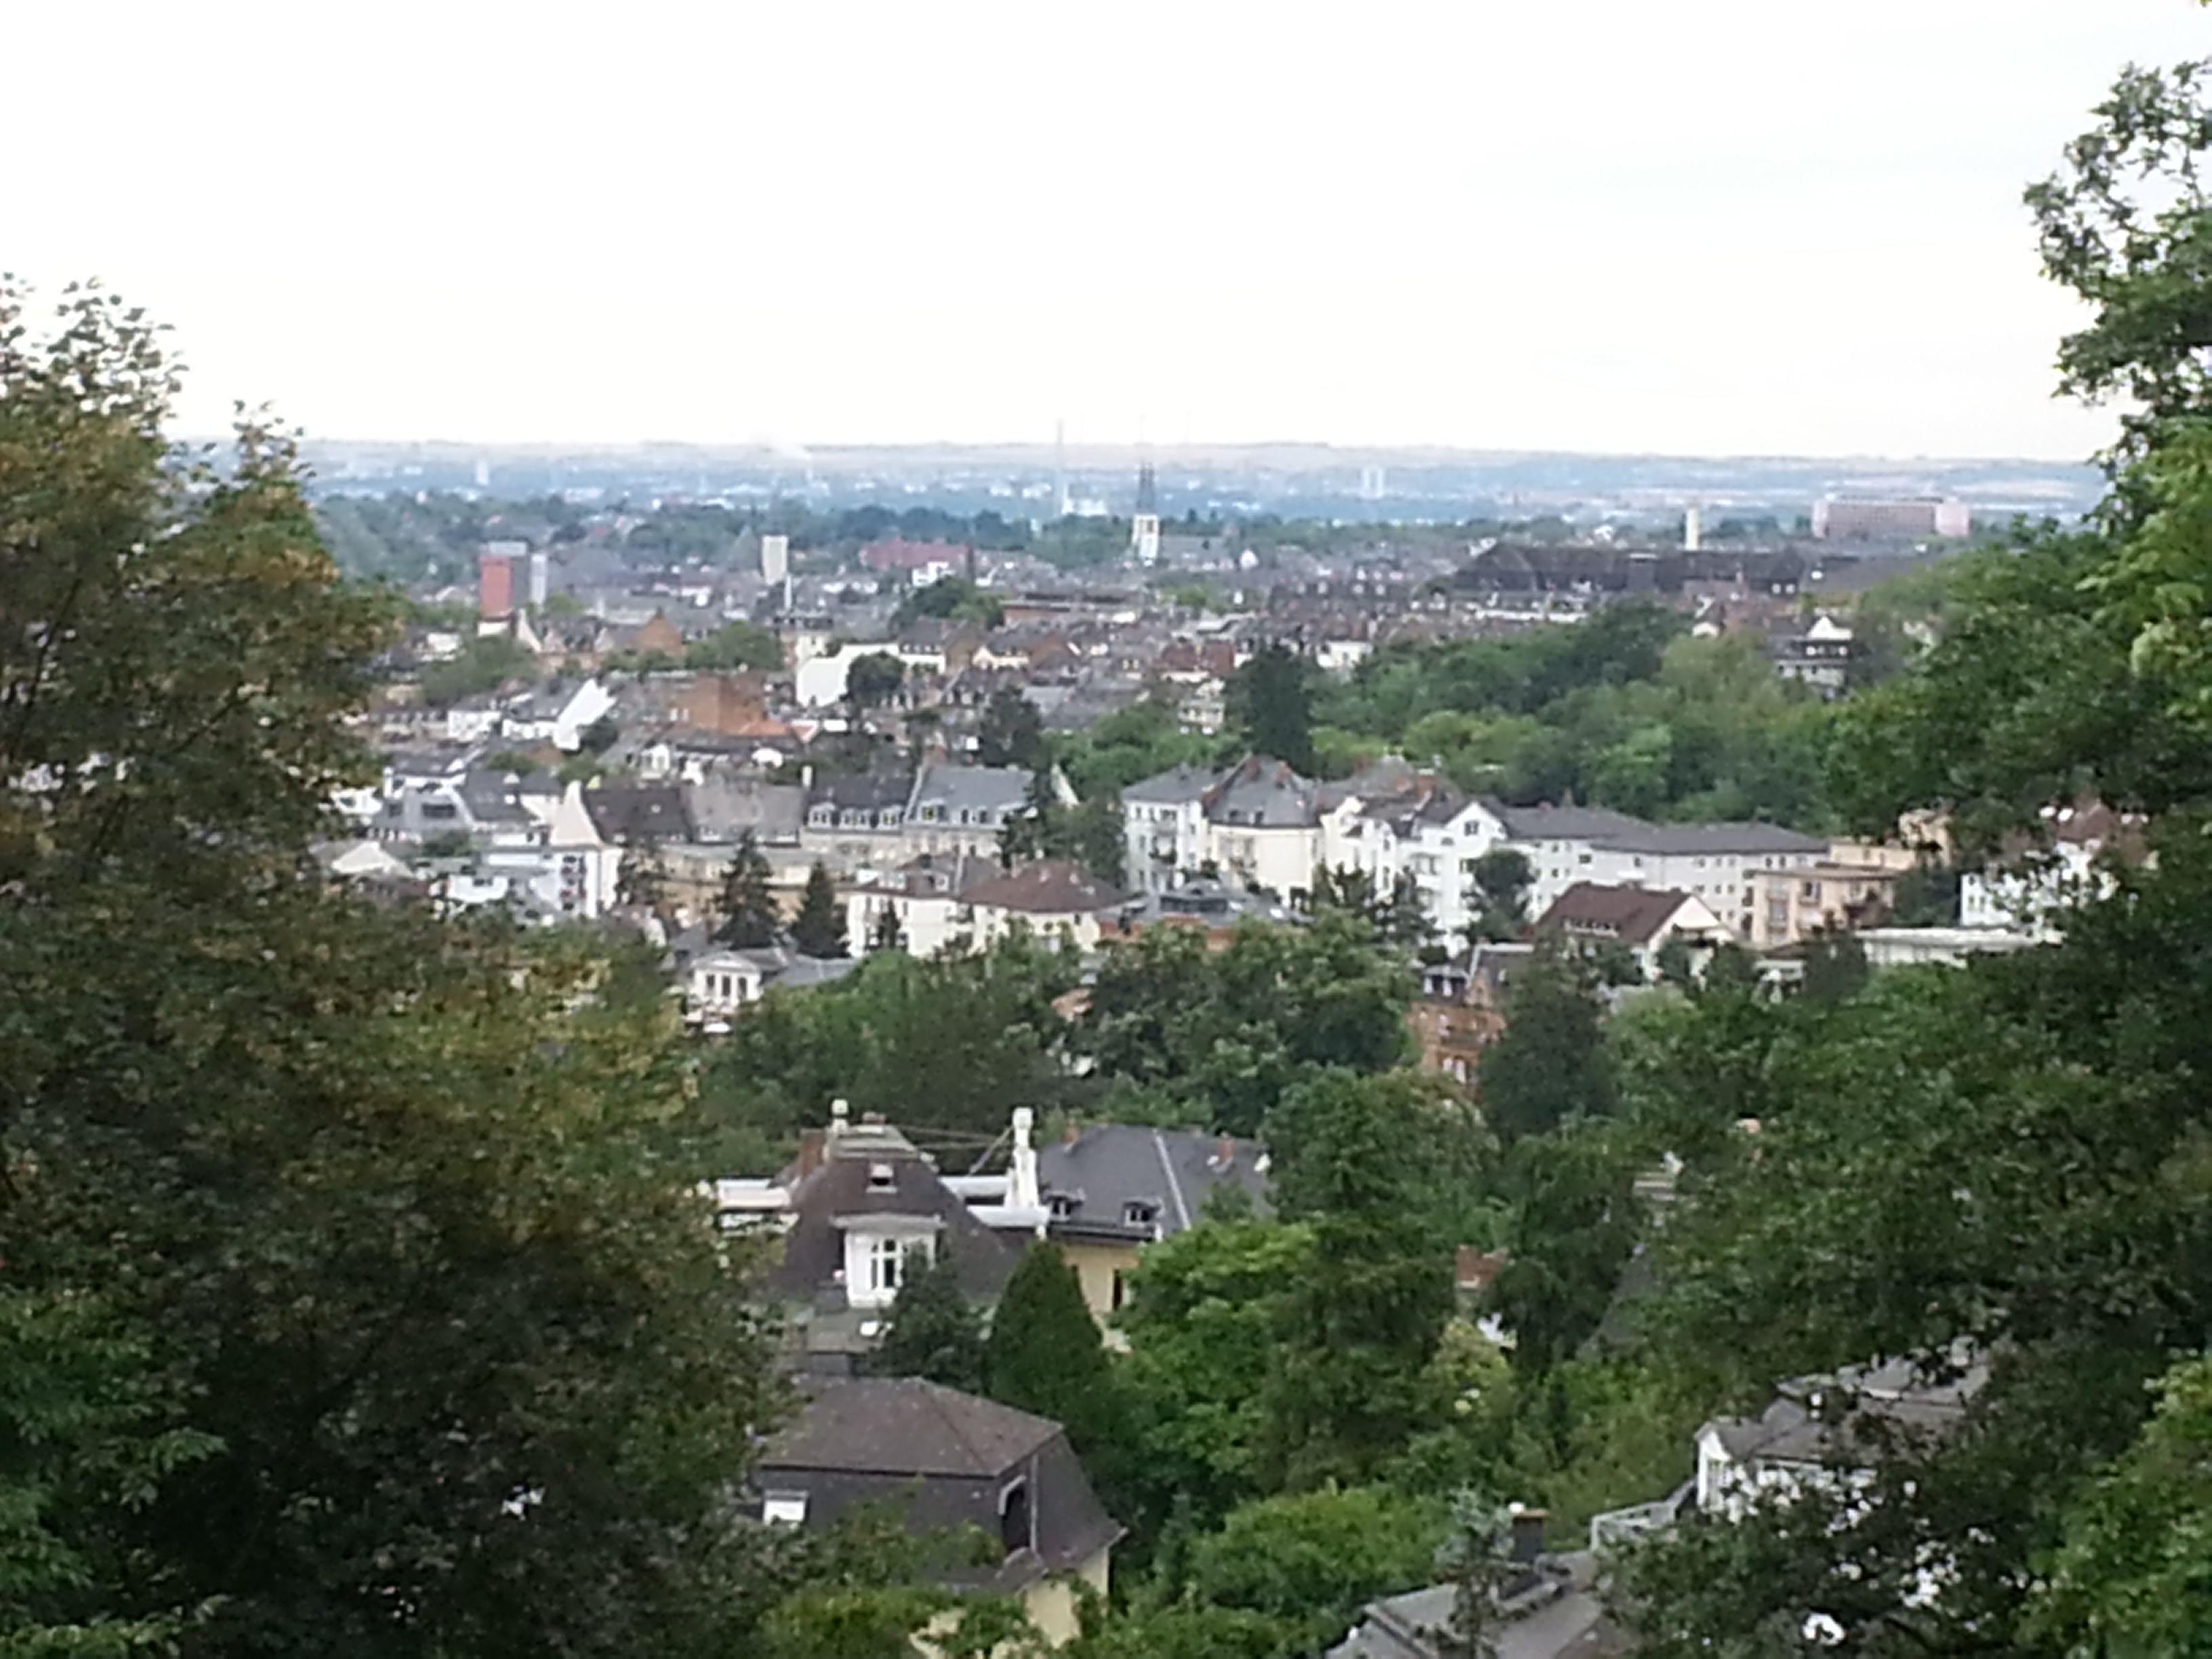 Bb Wiesbaden wiesbaden germany shanana was here wiesbaden